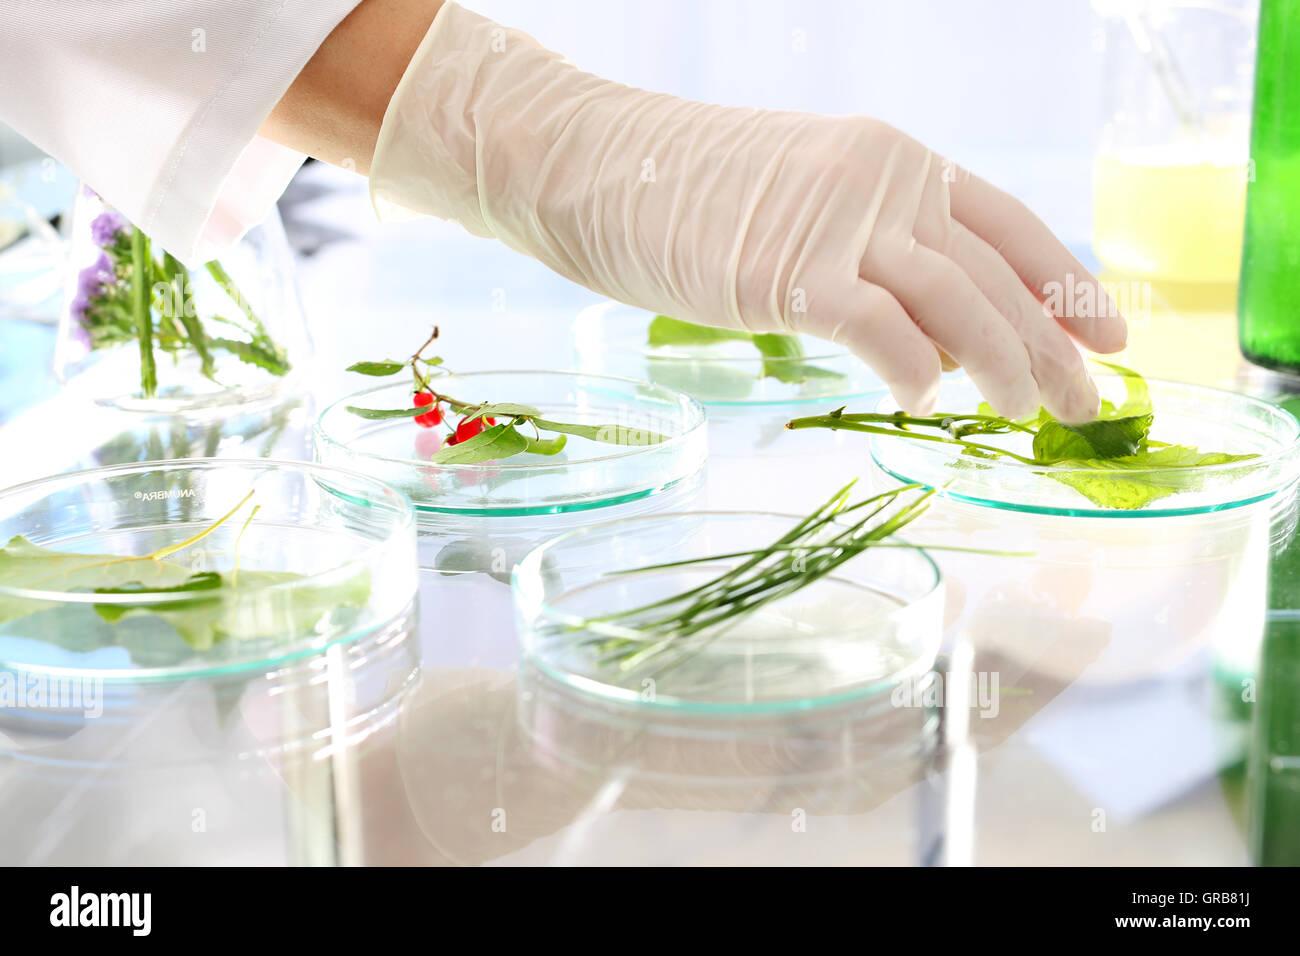 Genetically modified plants. - Stock Image